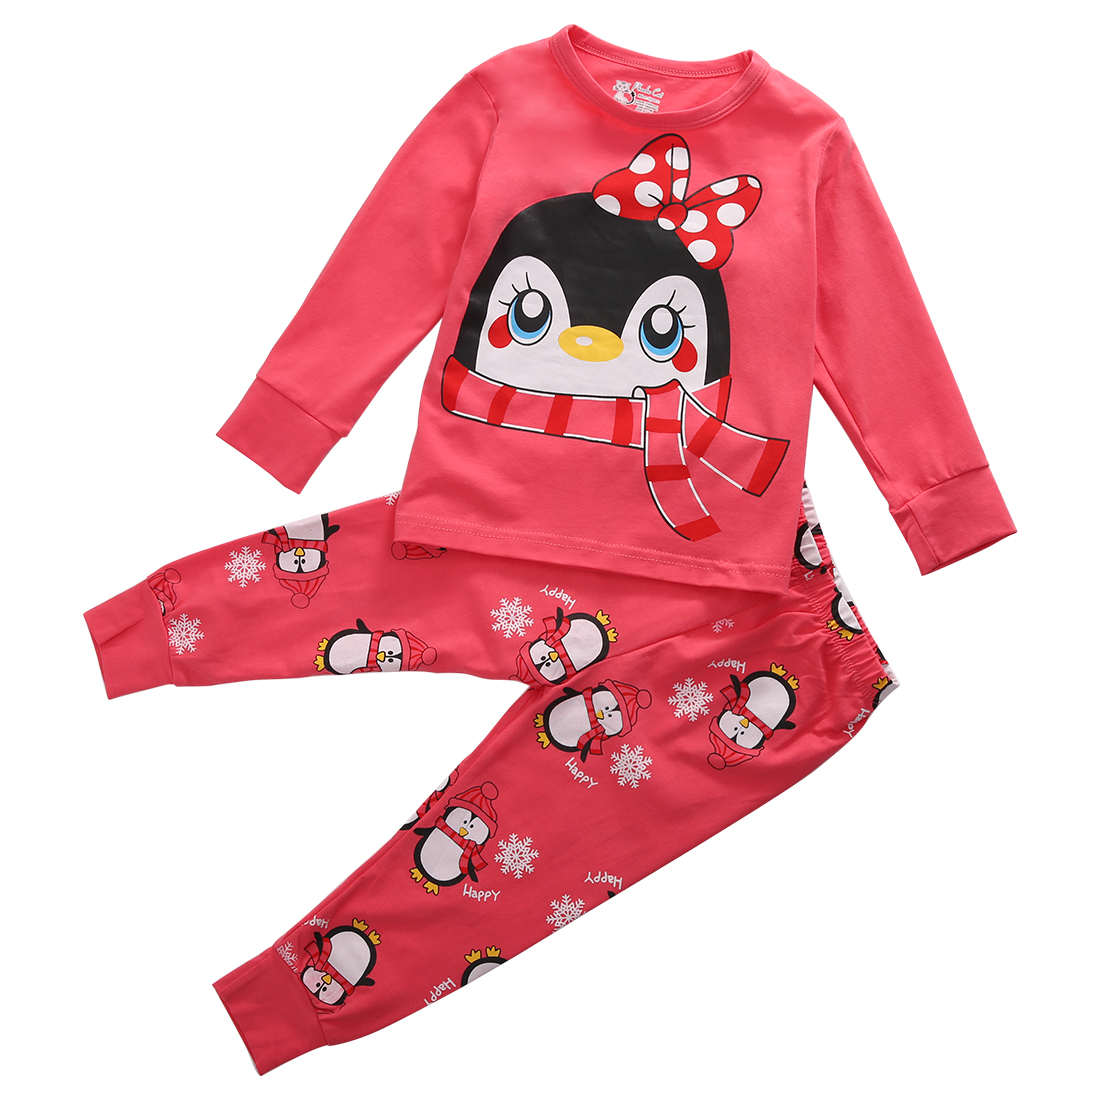 Pyjamas Kids For Children Cartoon Girl Long Sleeve Sleepwear Autumn Spring Warm Nightwear Tops Bottoms 2pcs Baby Girls 1-7 Years